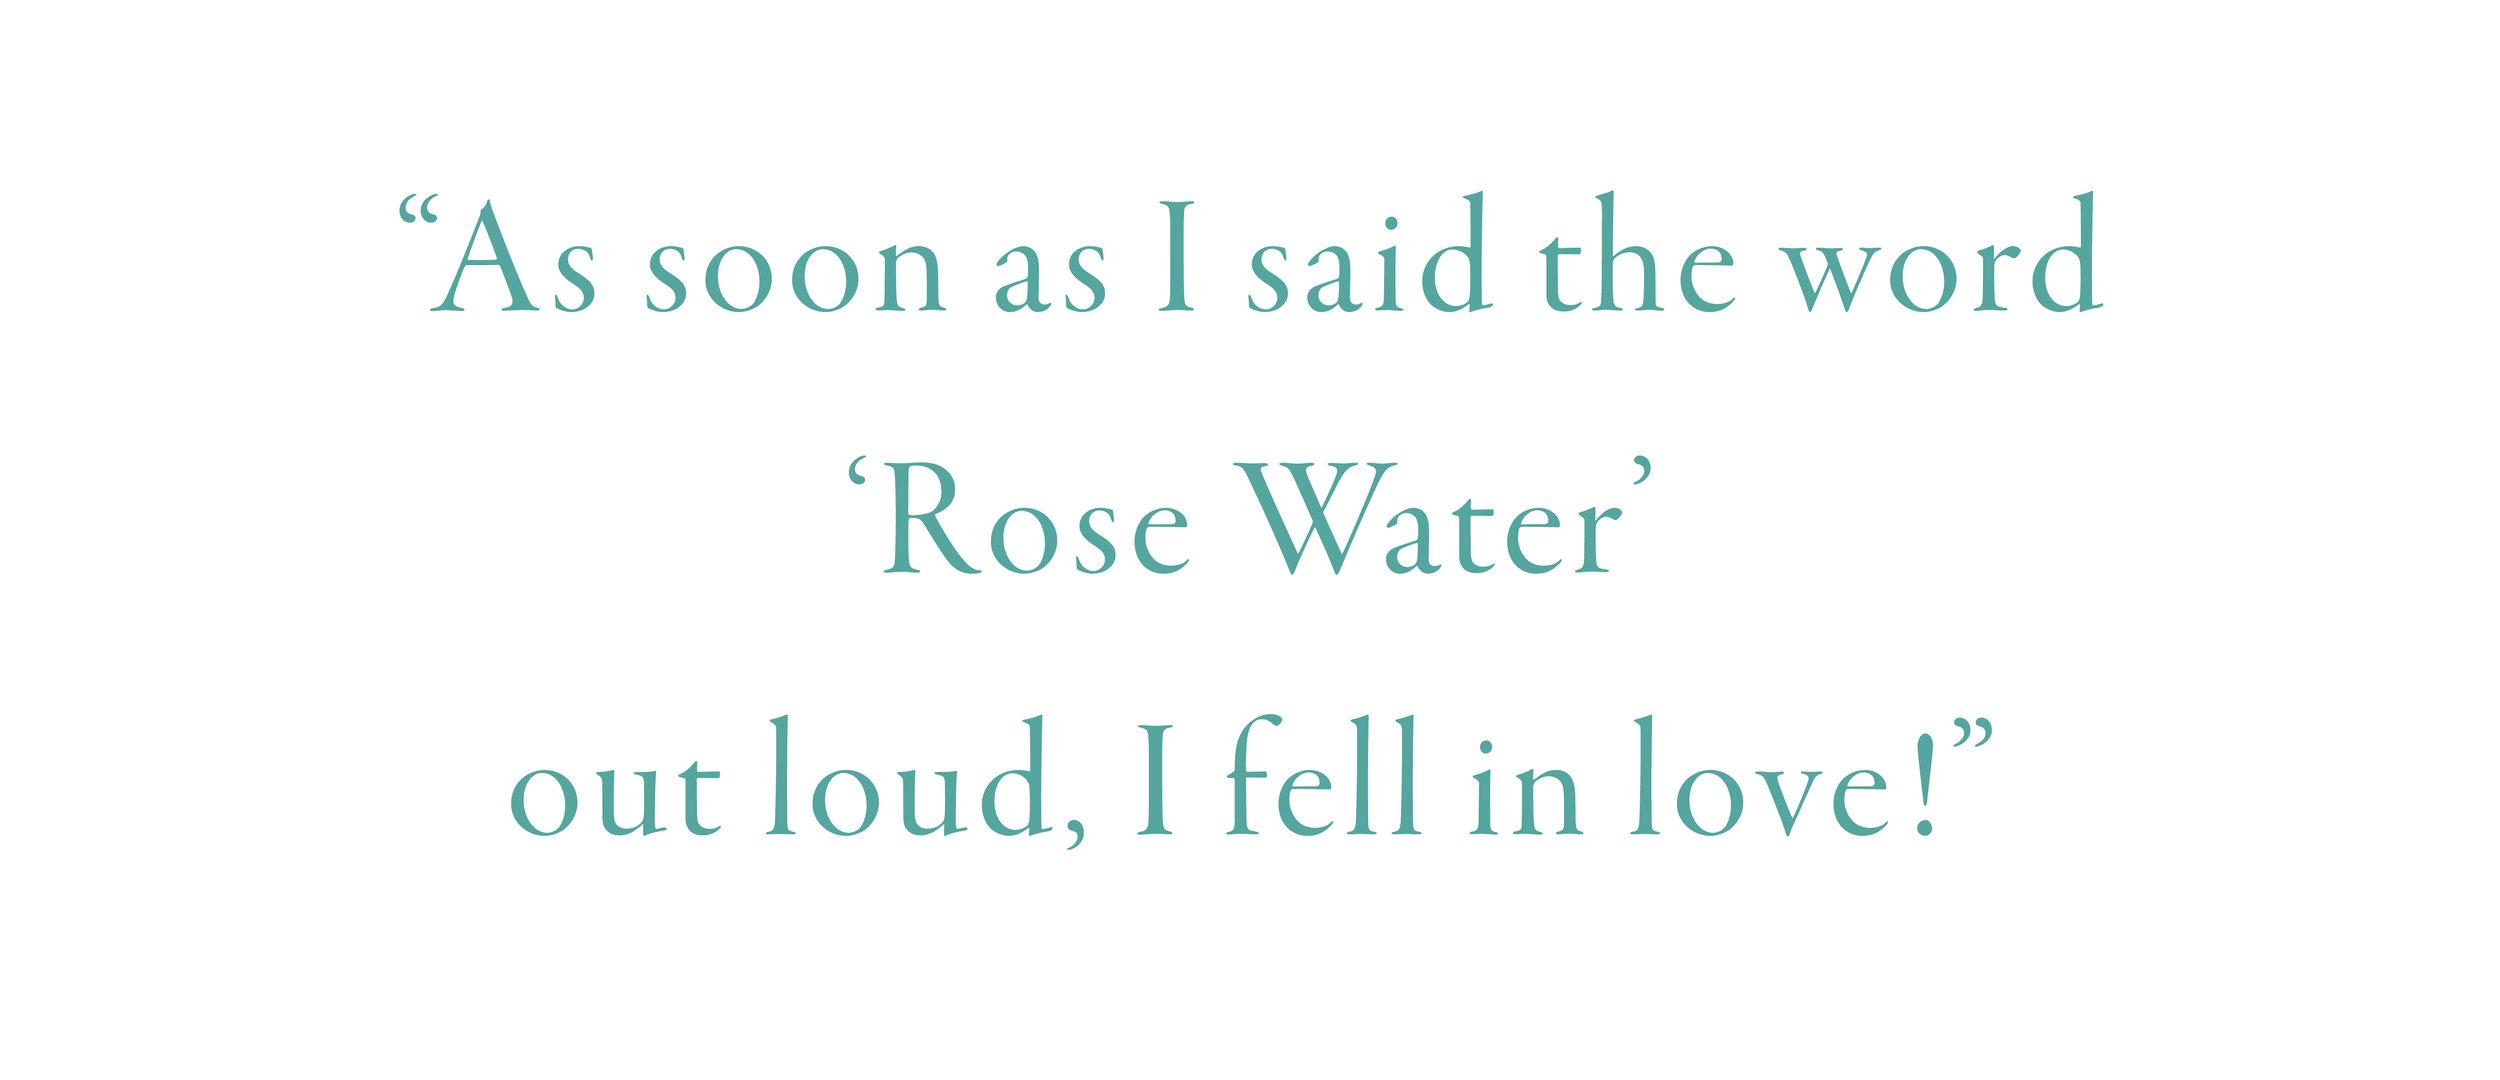 19years-blogpost-rosewatername-03.jpg